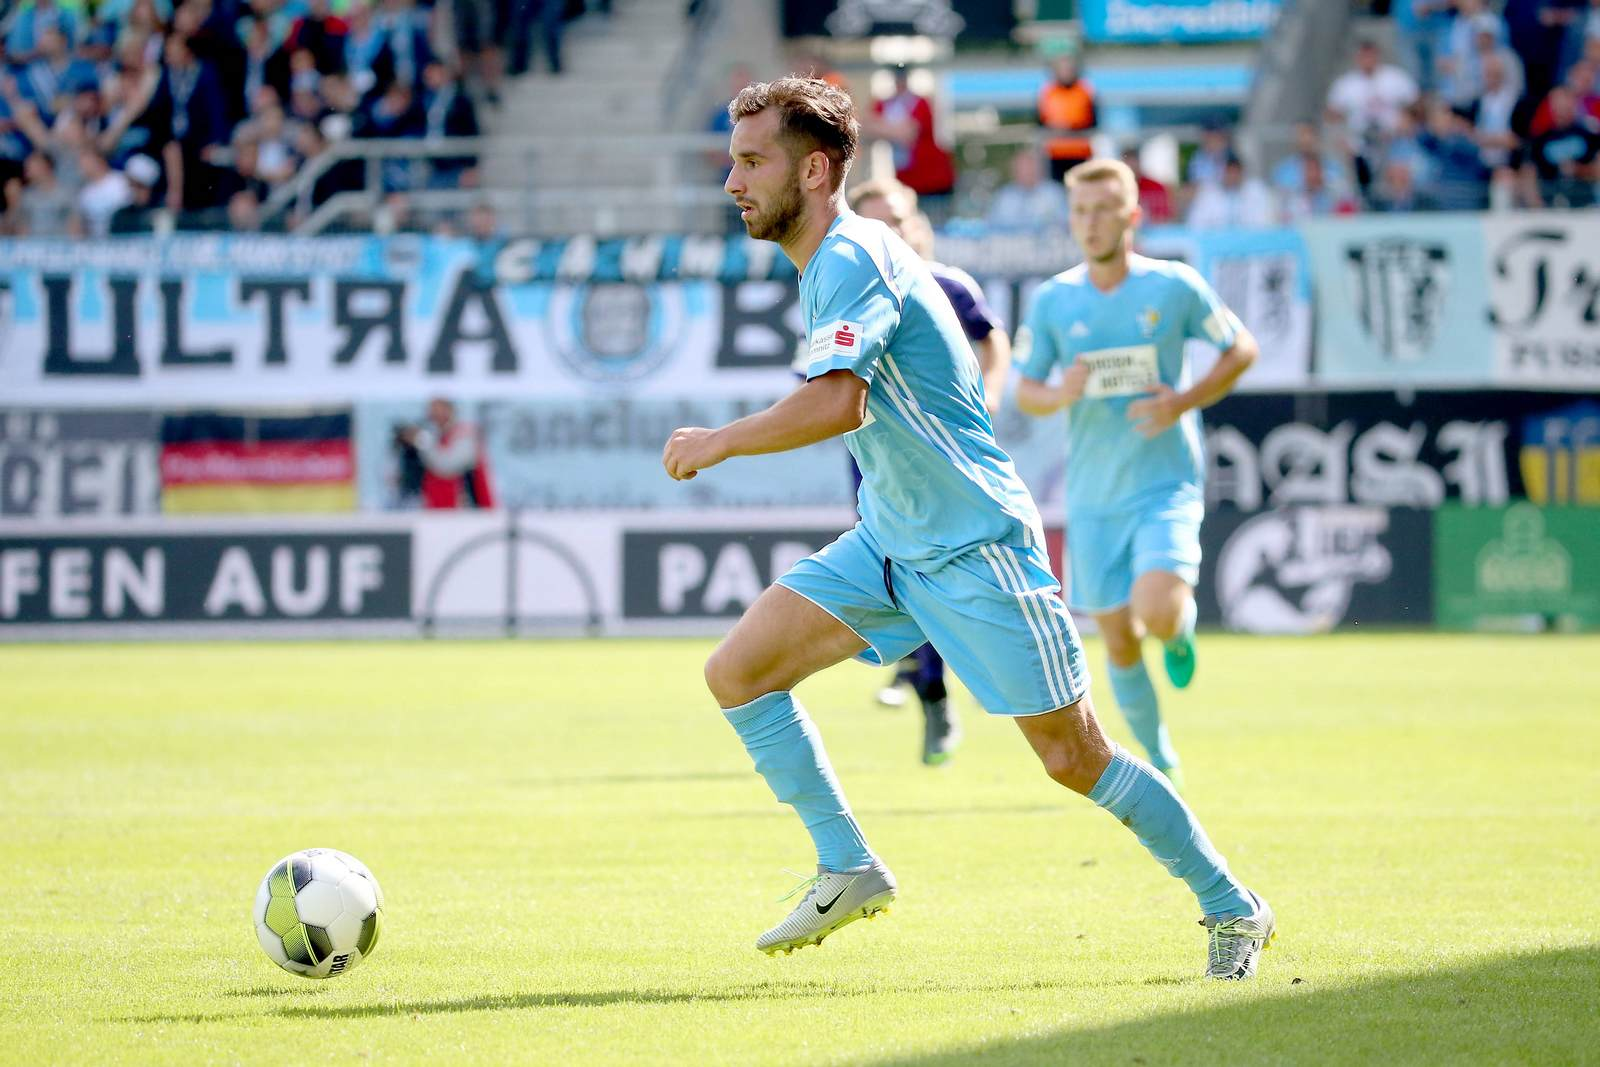 Okan Aydin vom Chemnitzer FC